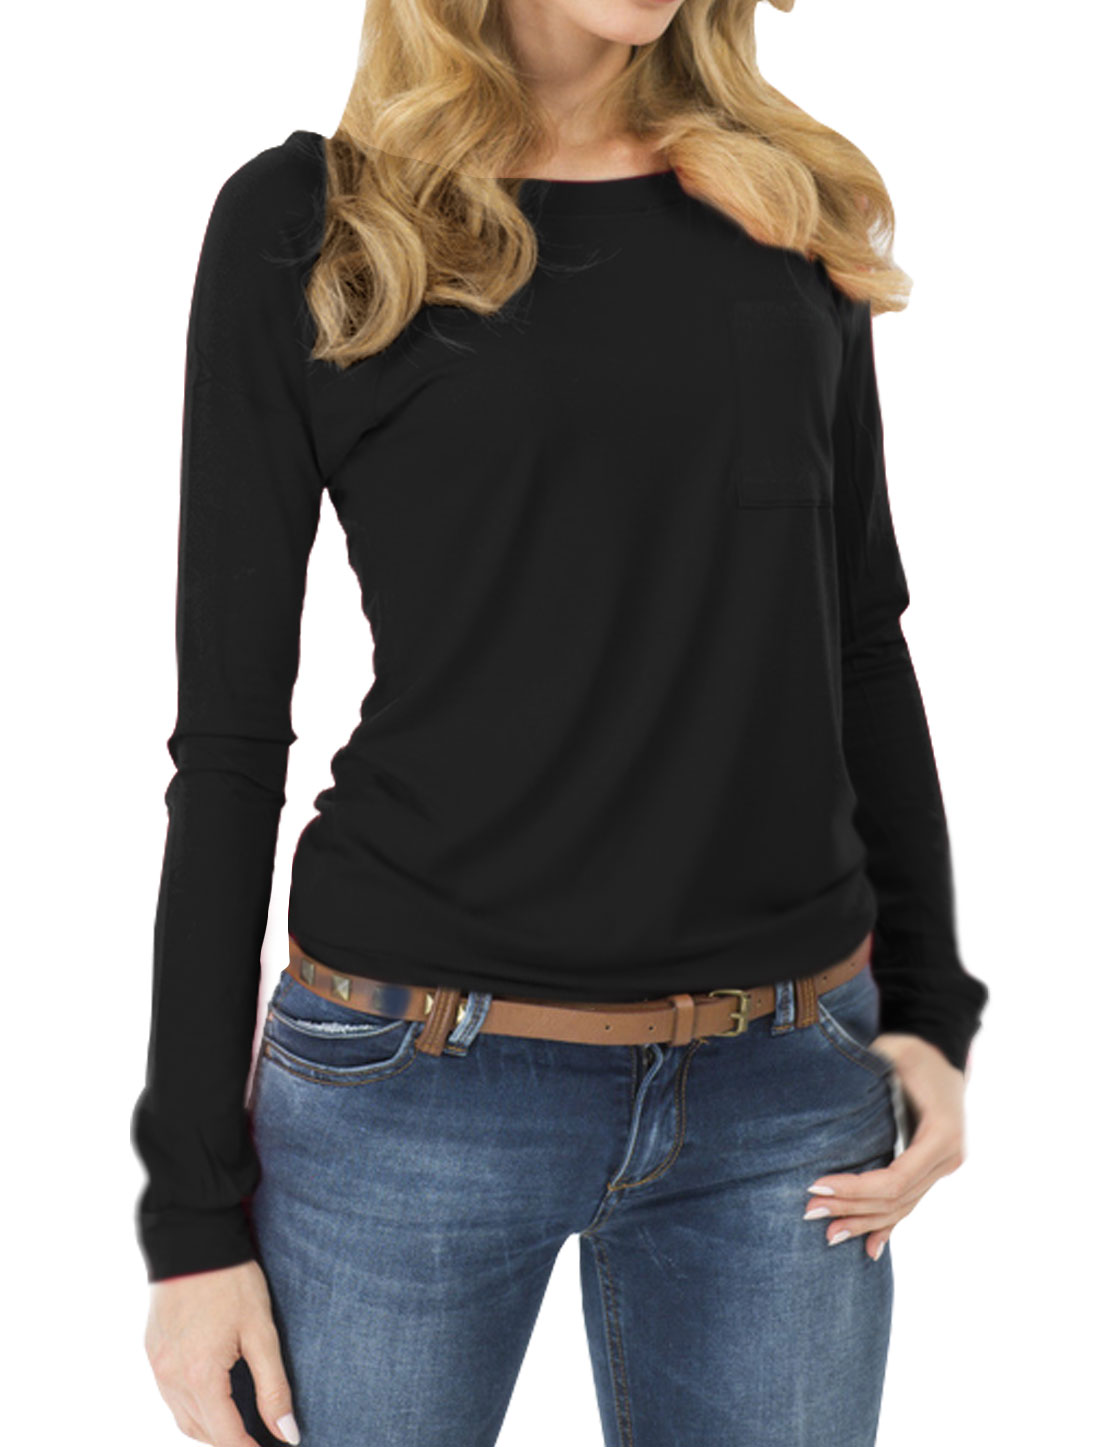 Women Raglan Sleeves Slim Fit Tee Shirt w Pocket Black M